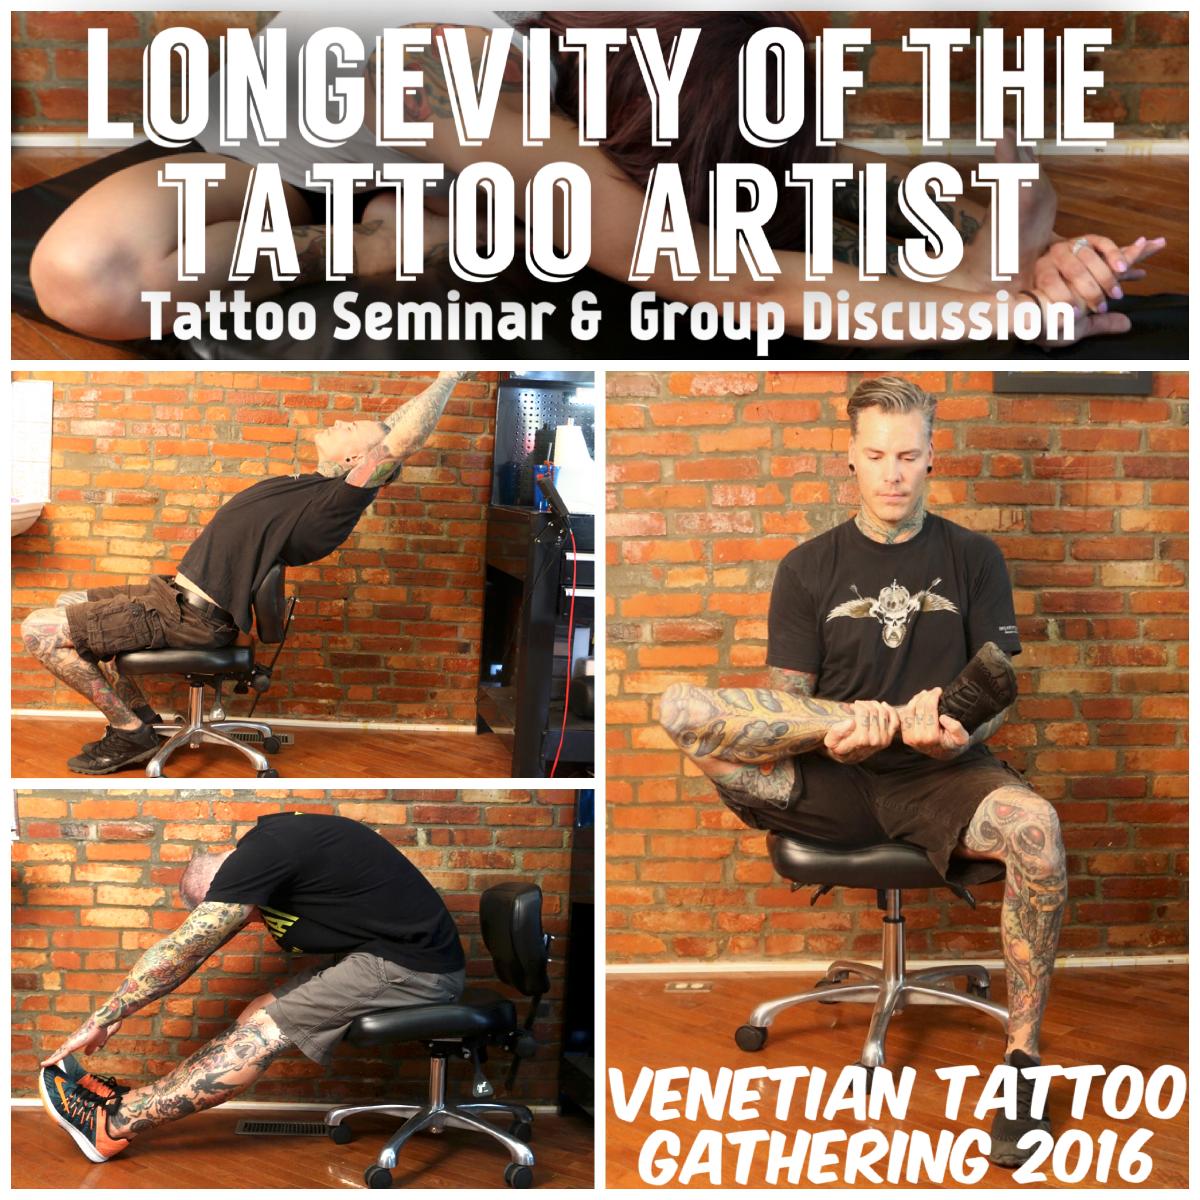 Durb - Longevity Seminar - Venetian Tattoo Gathering